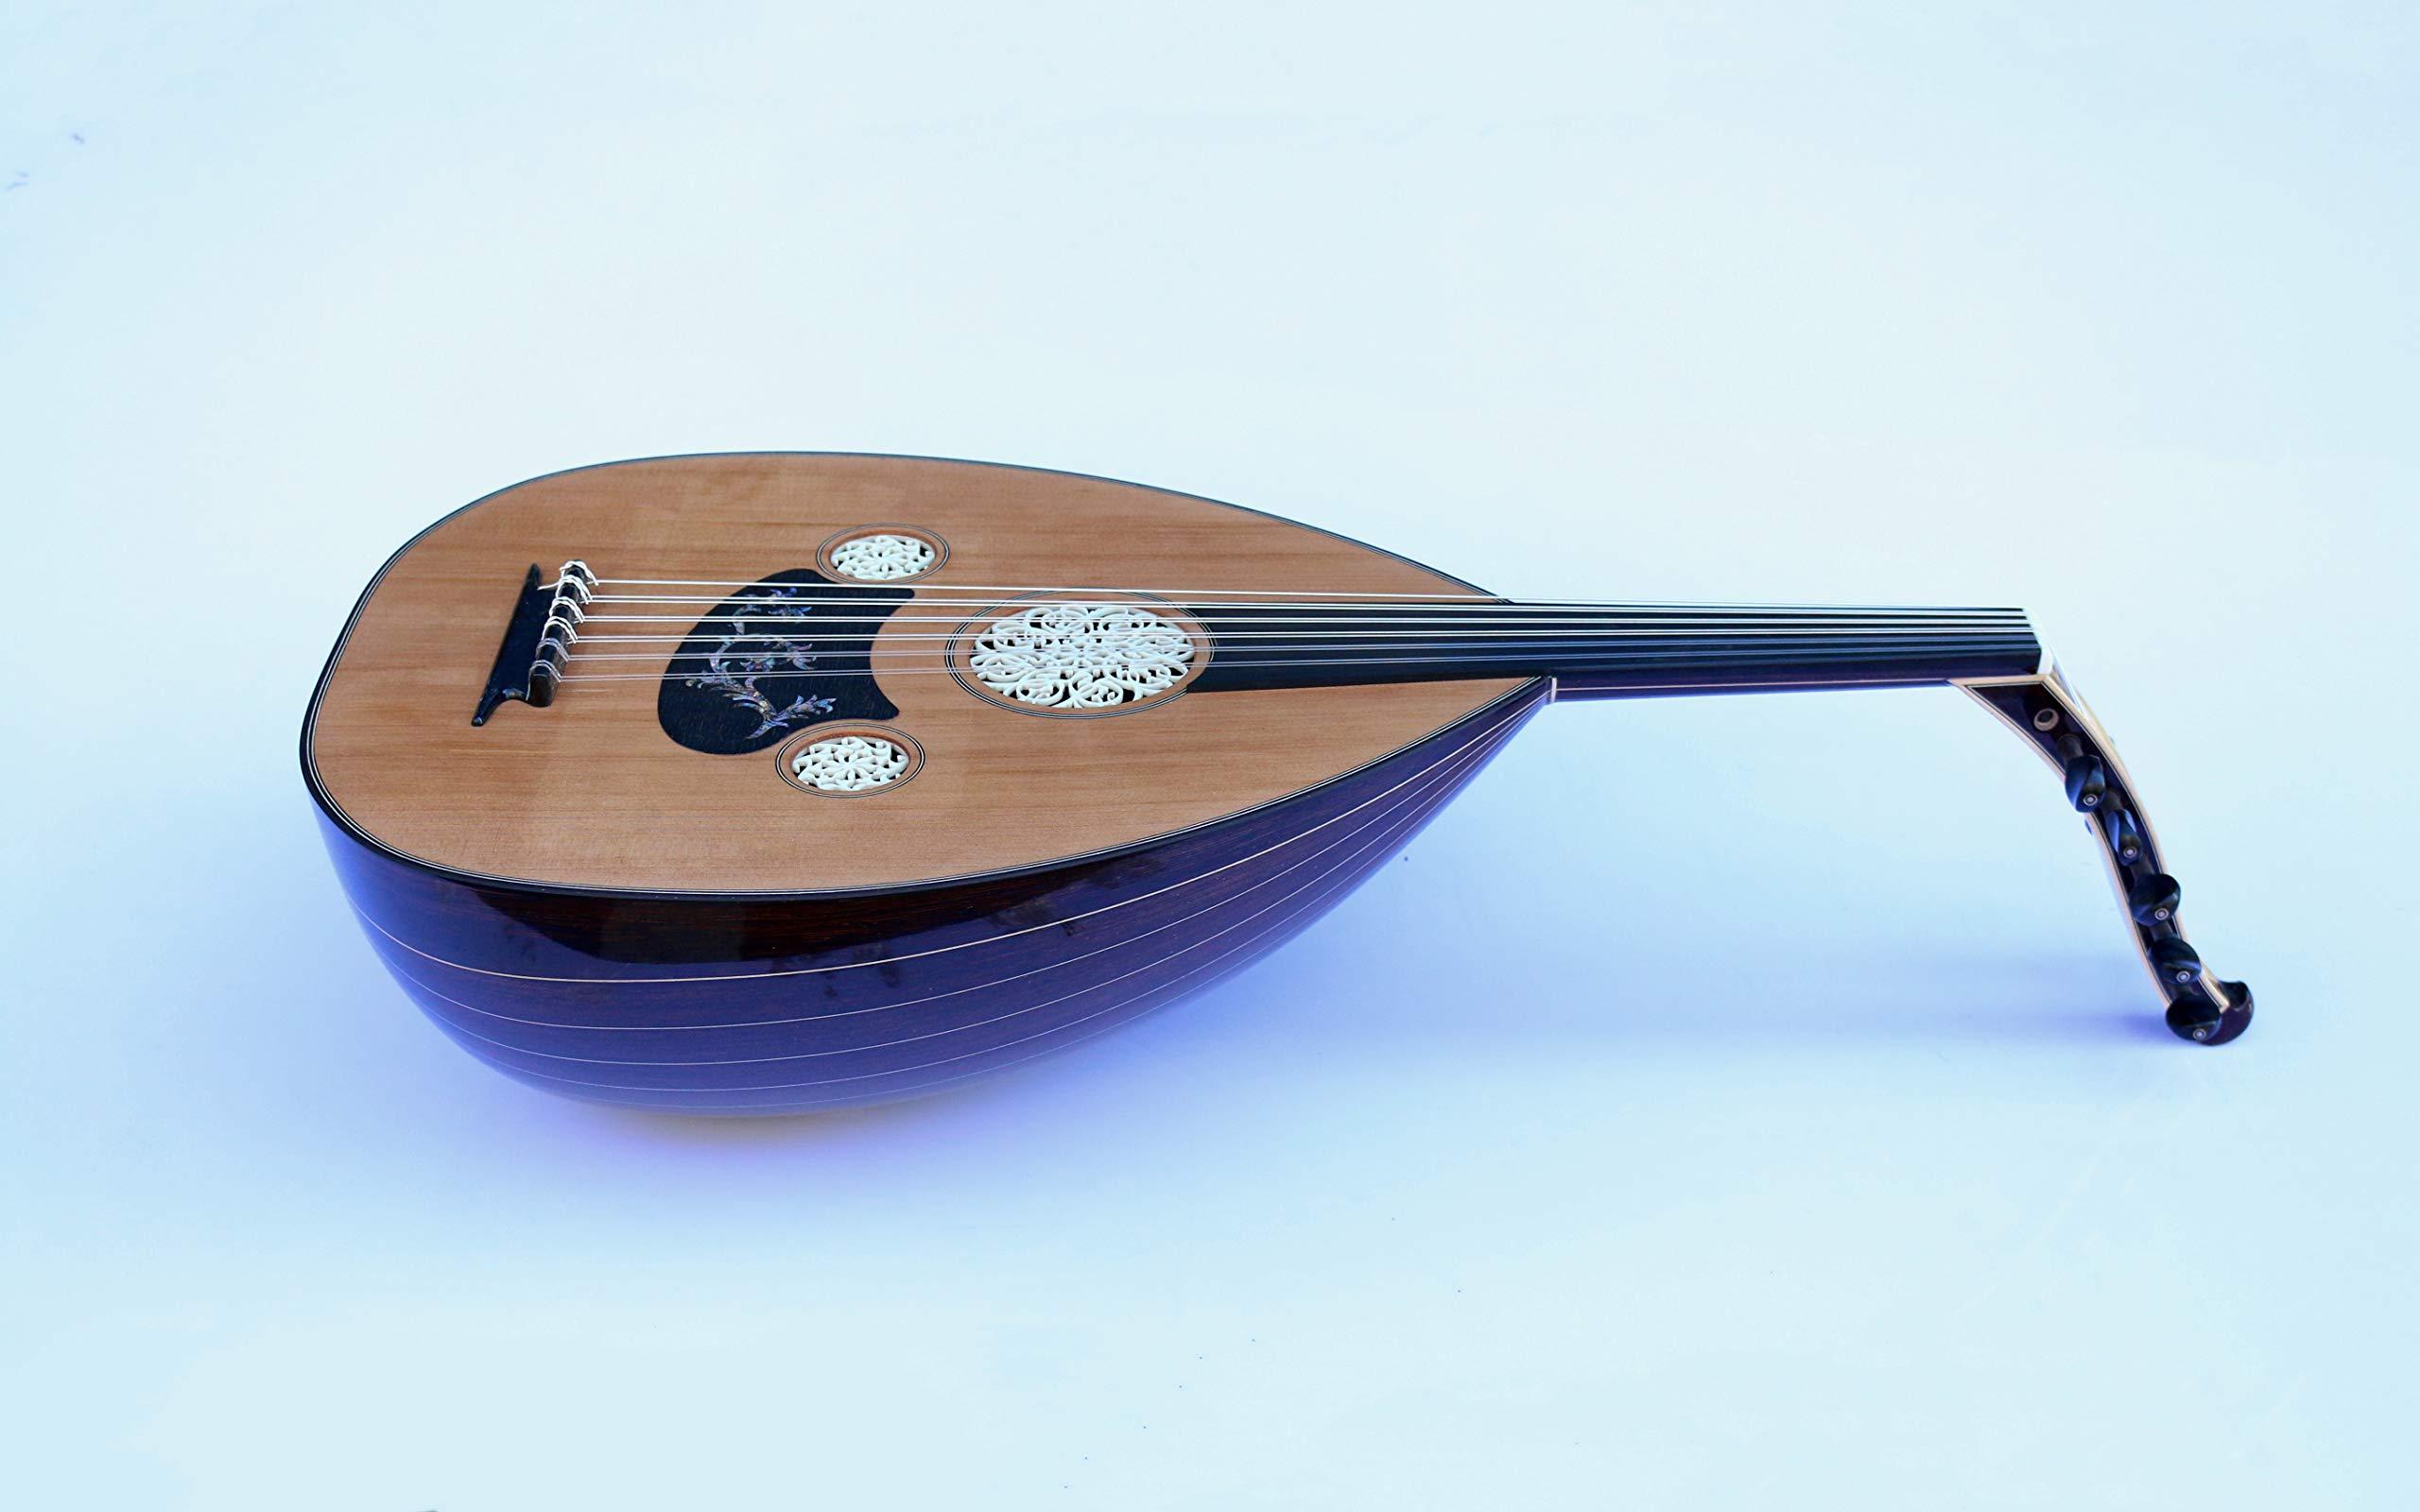 Premium Turkish Oud SALA-O8 | Oud String Musical Instrument Ud Aoud